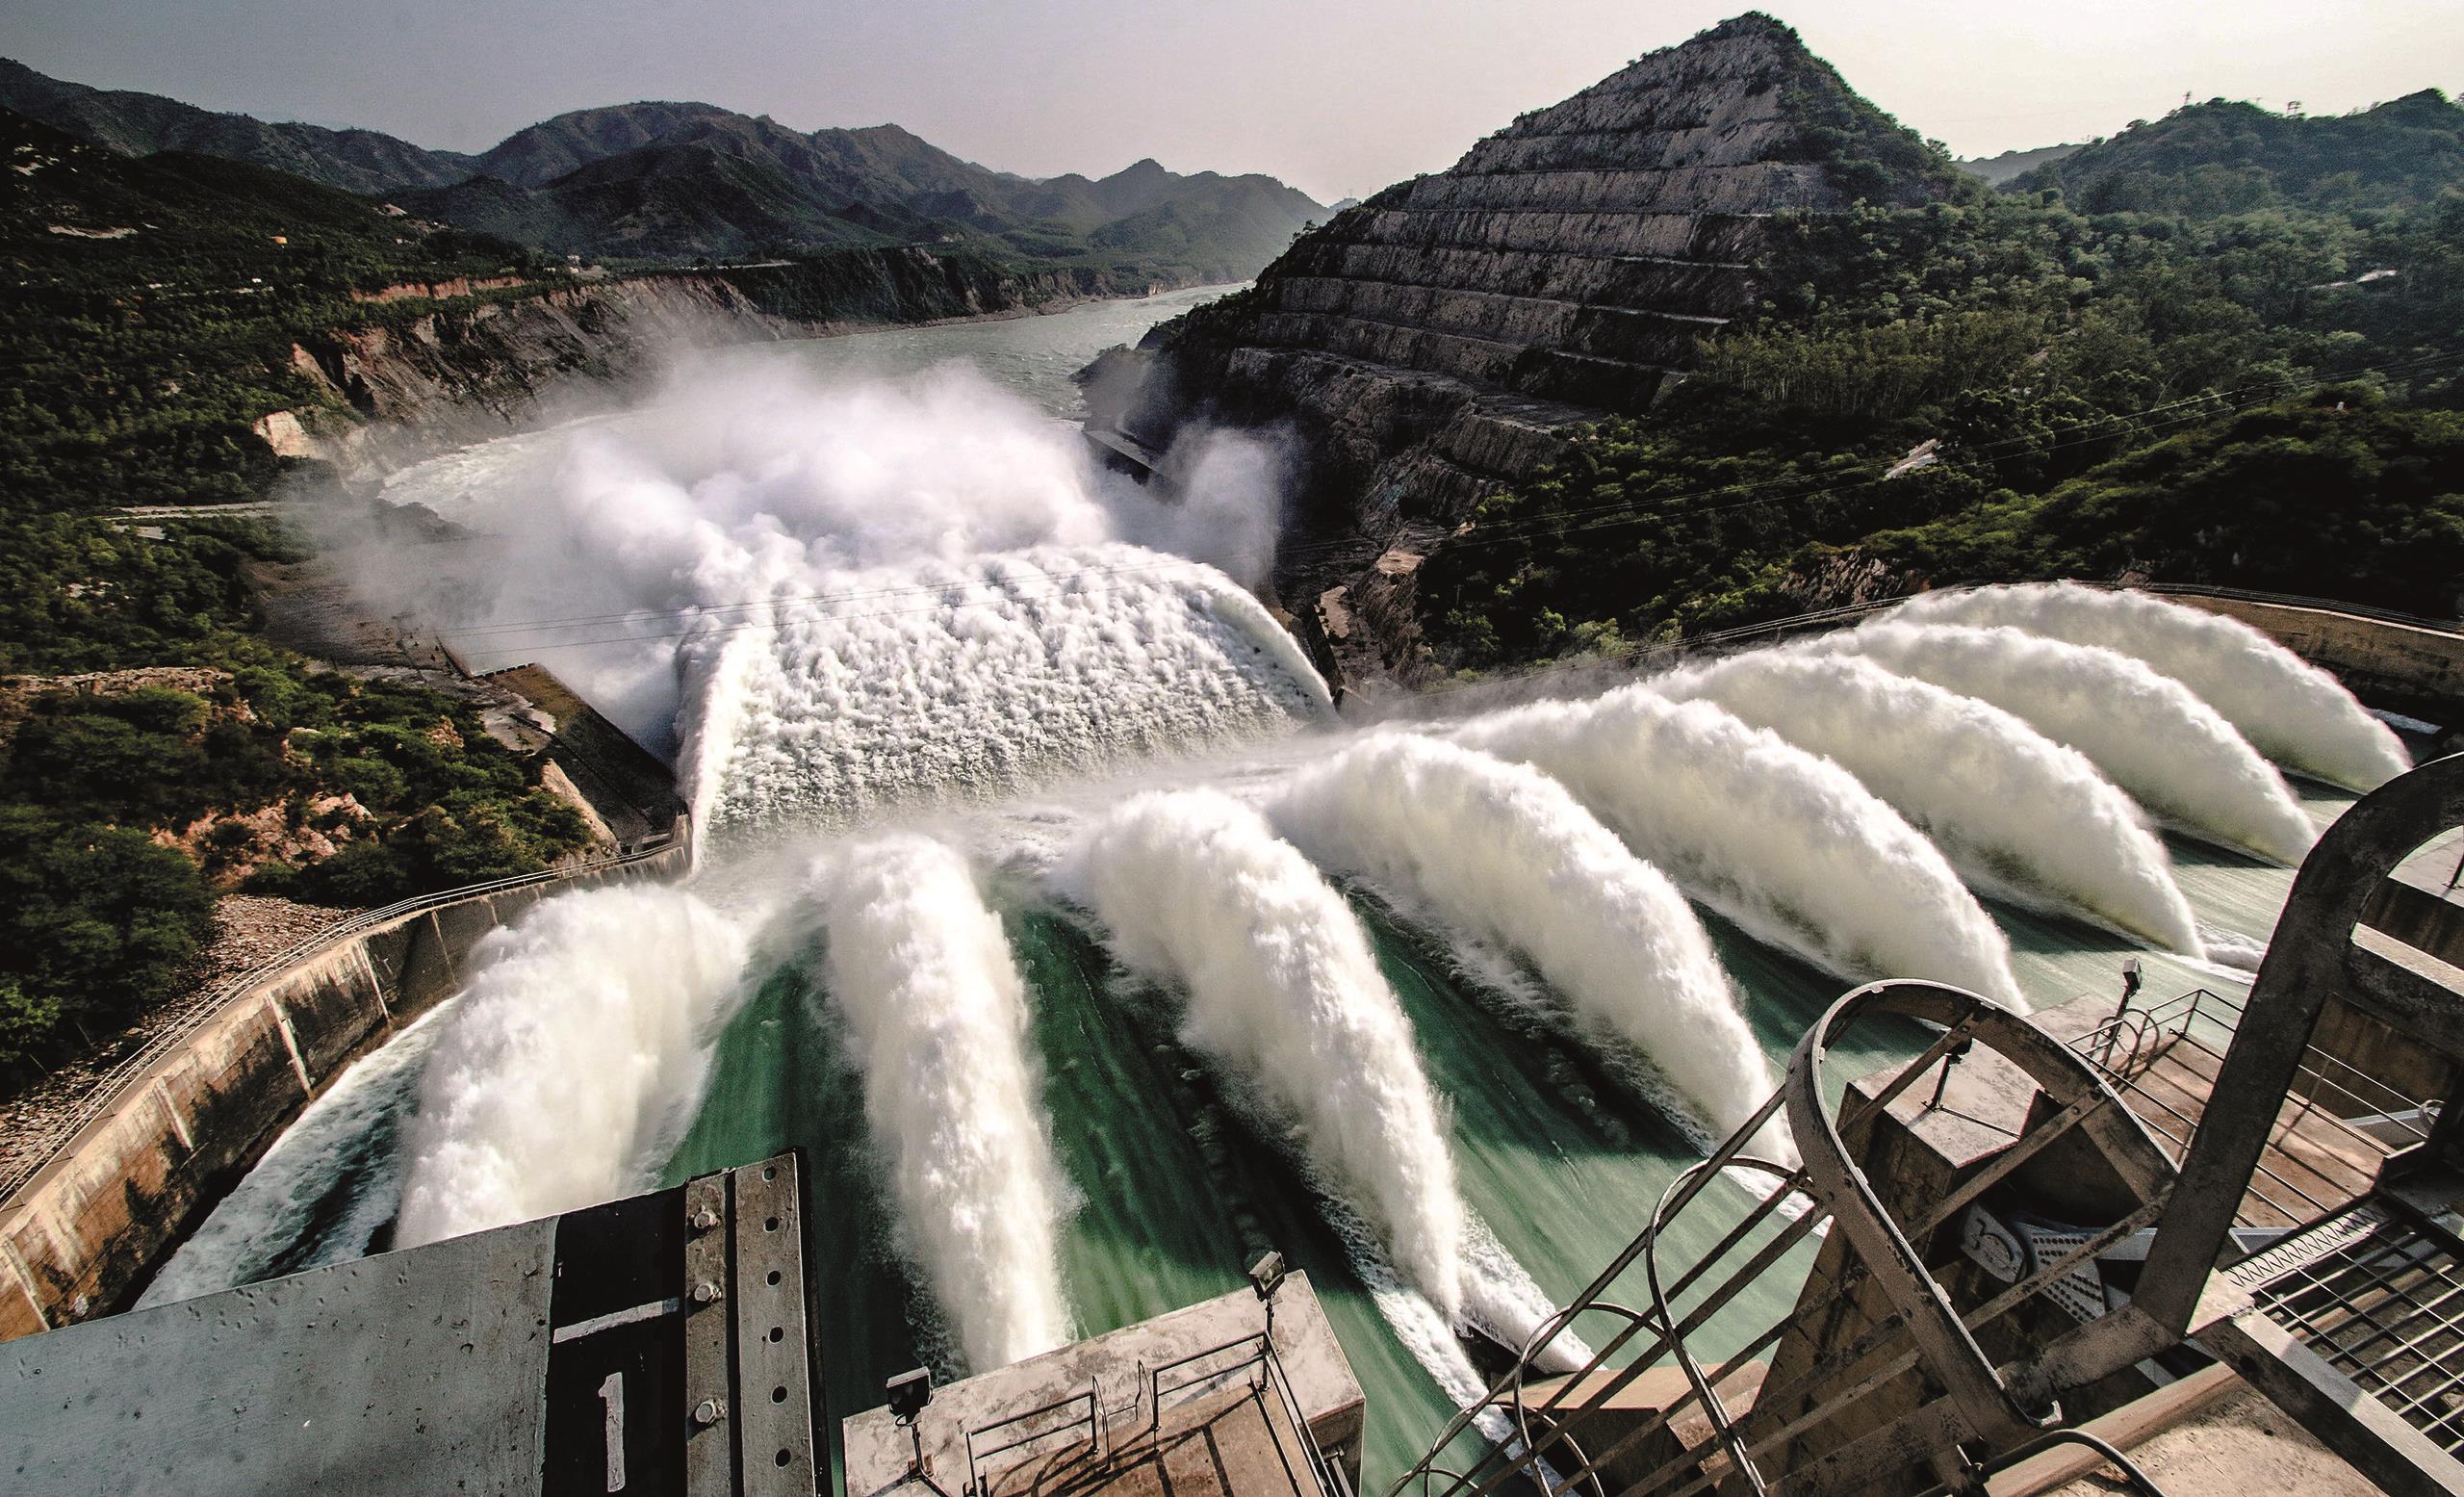 Tarbela 4th extension hydropower project, Pakistan - Mott